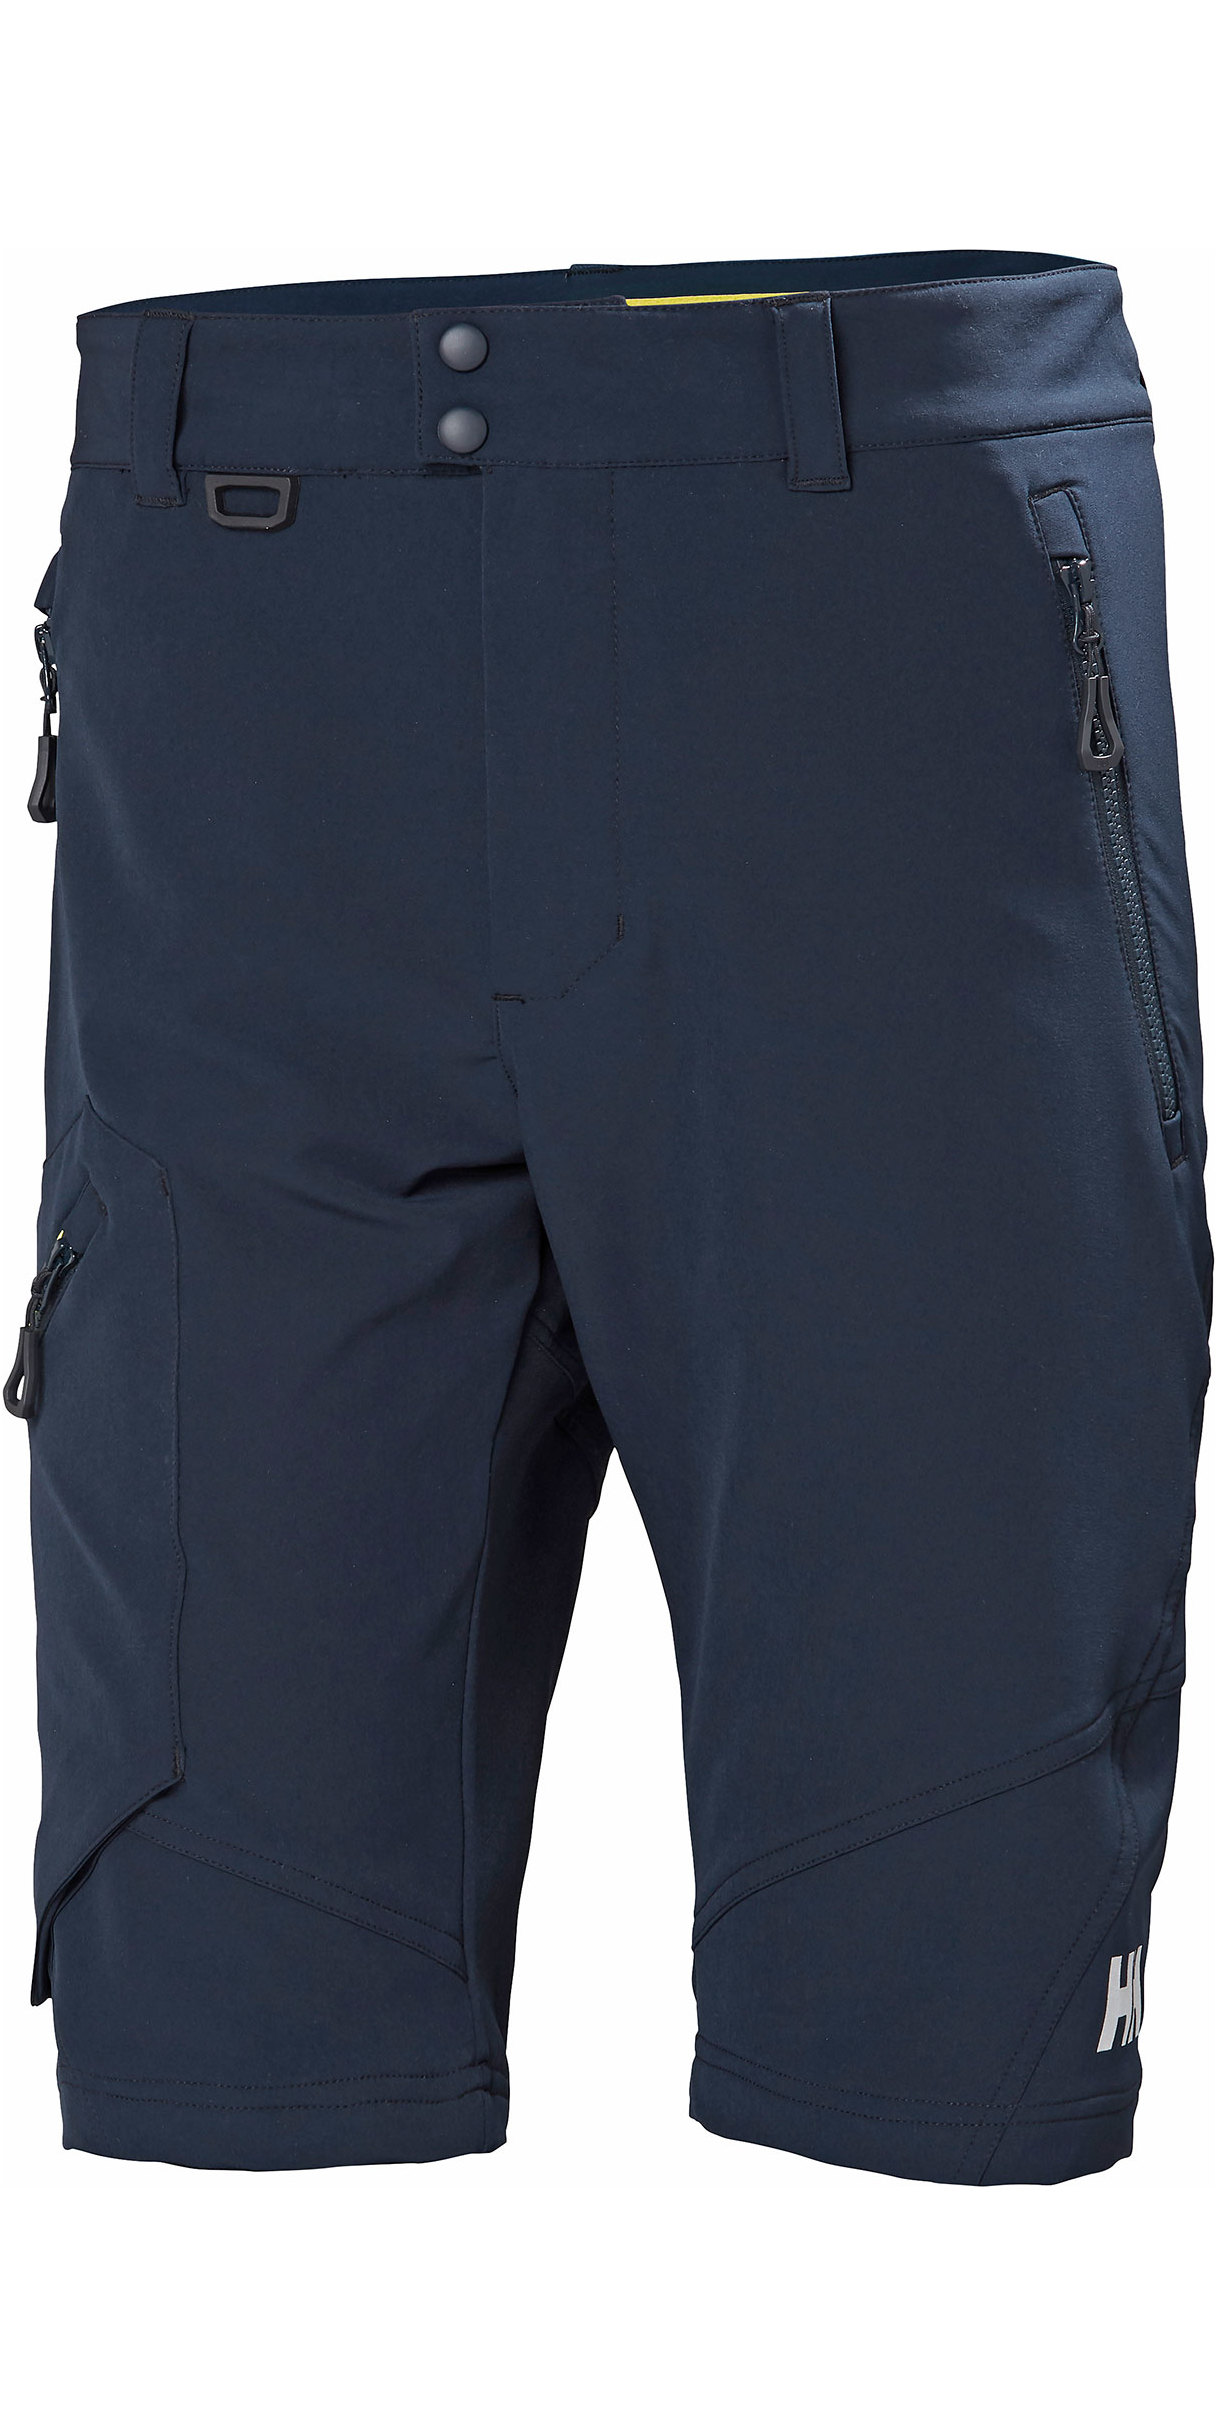 2019 Shorts Softshell HP Pour Hommes Helly Hansen Navy 34056